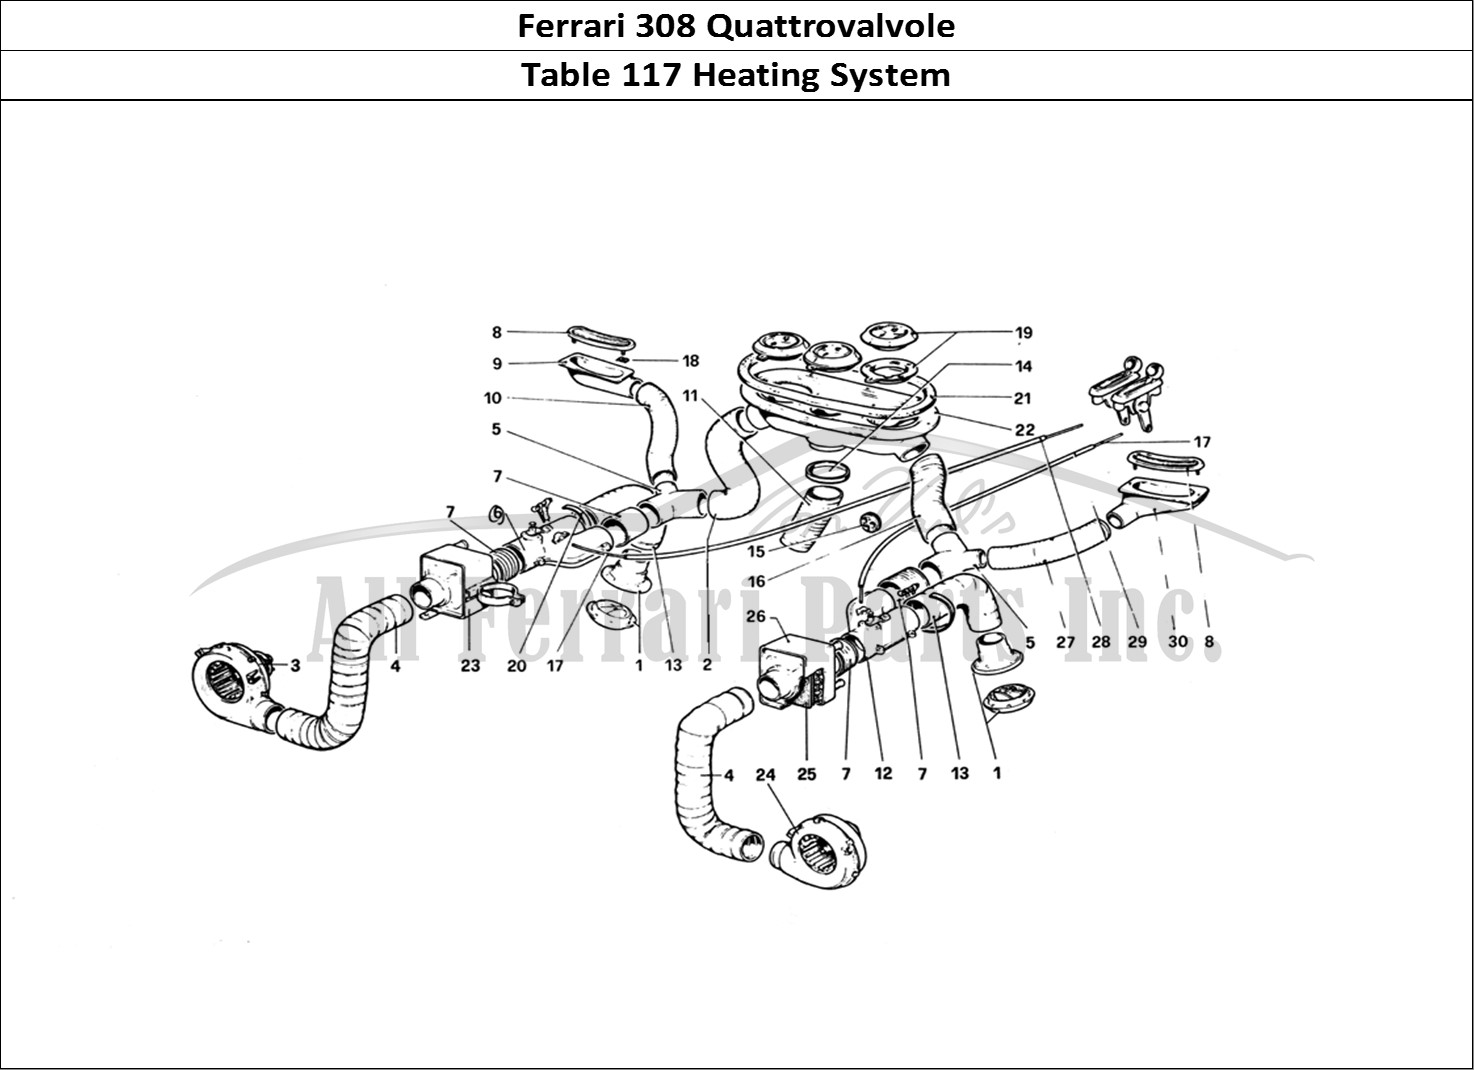 Buy original Ferrari 308 Quattrovalvole 117 Heating System